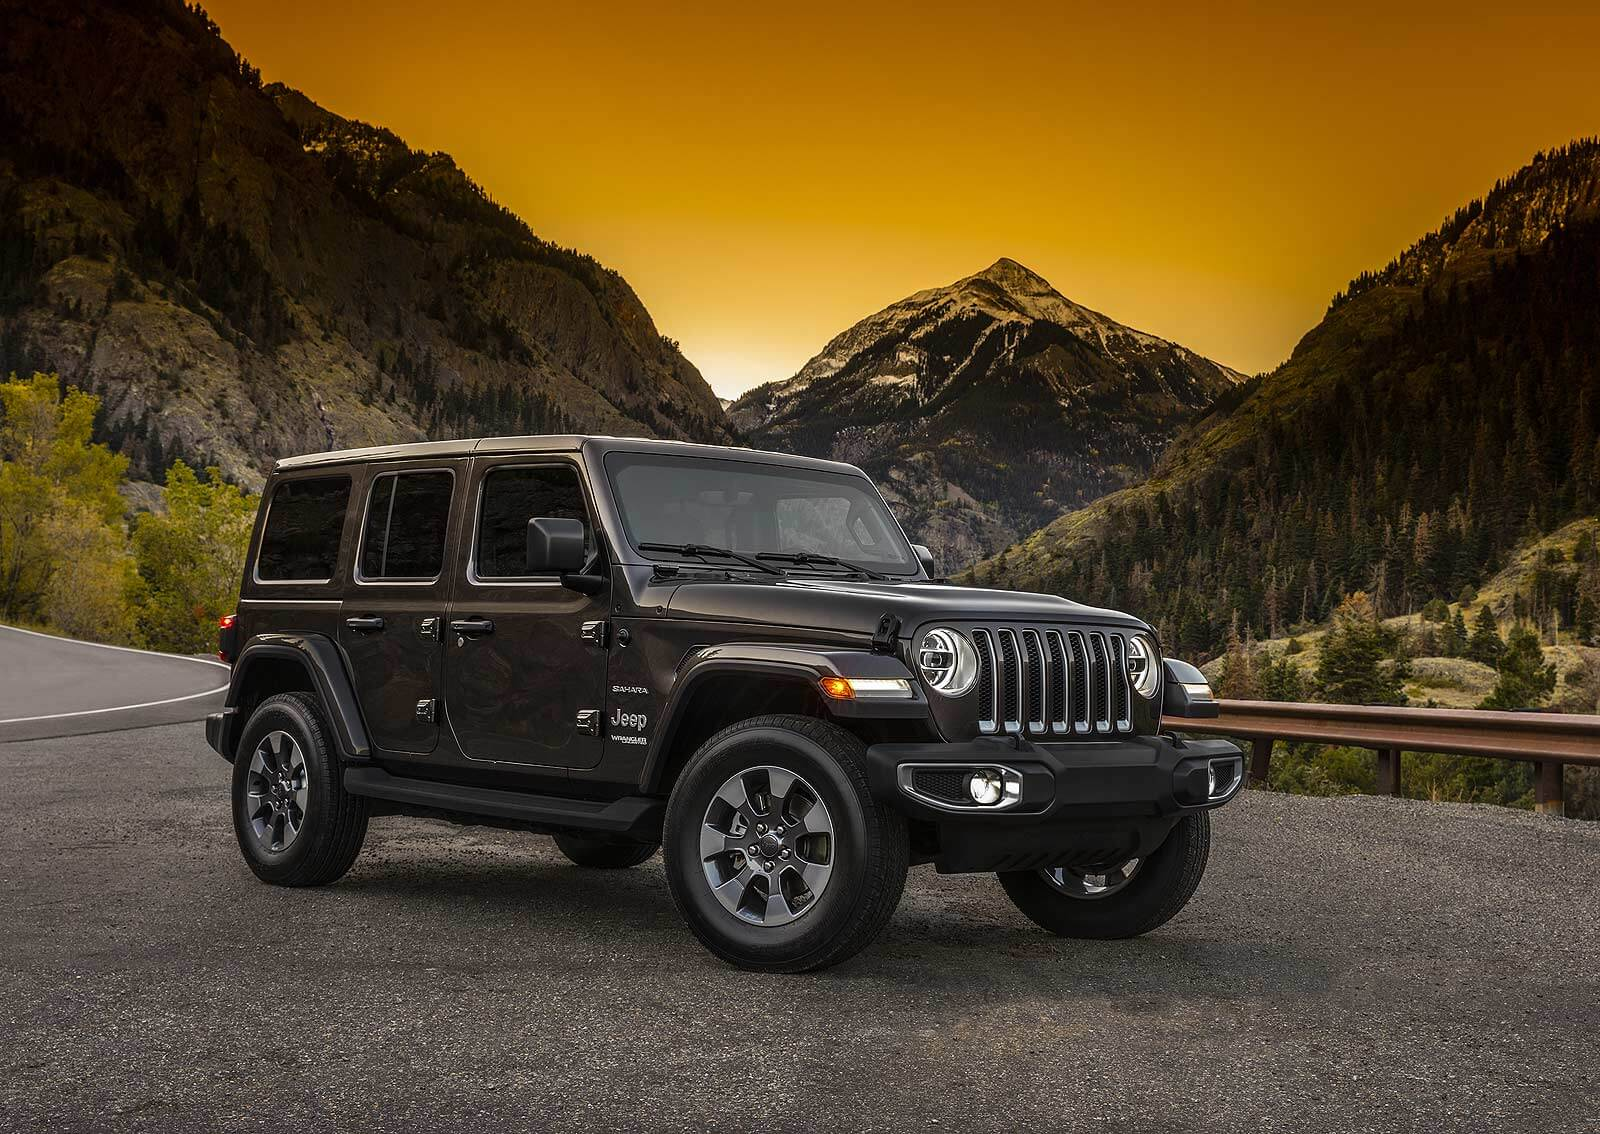 vista medio perfil jeep wrangler 2018